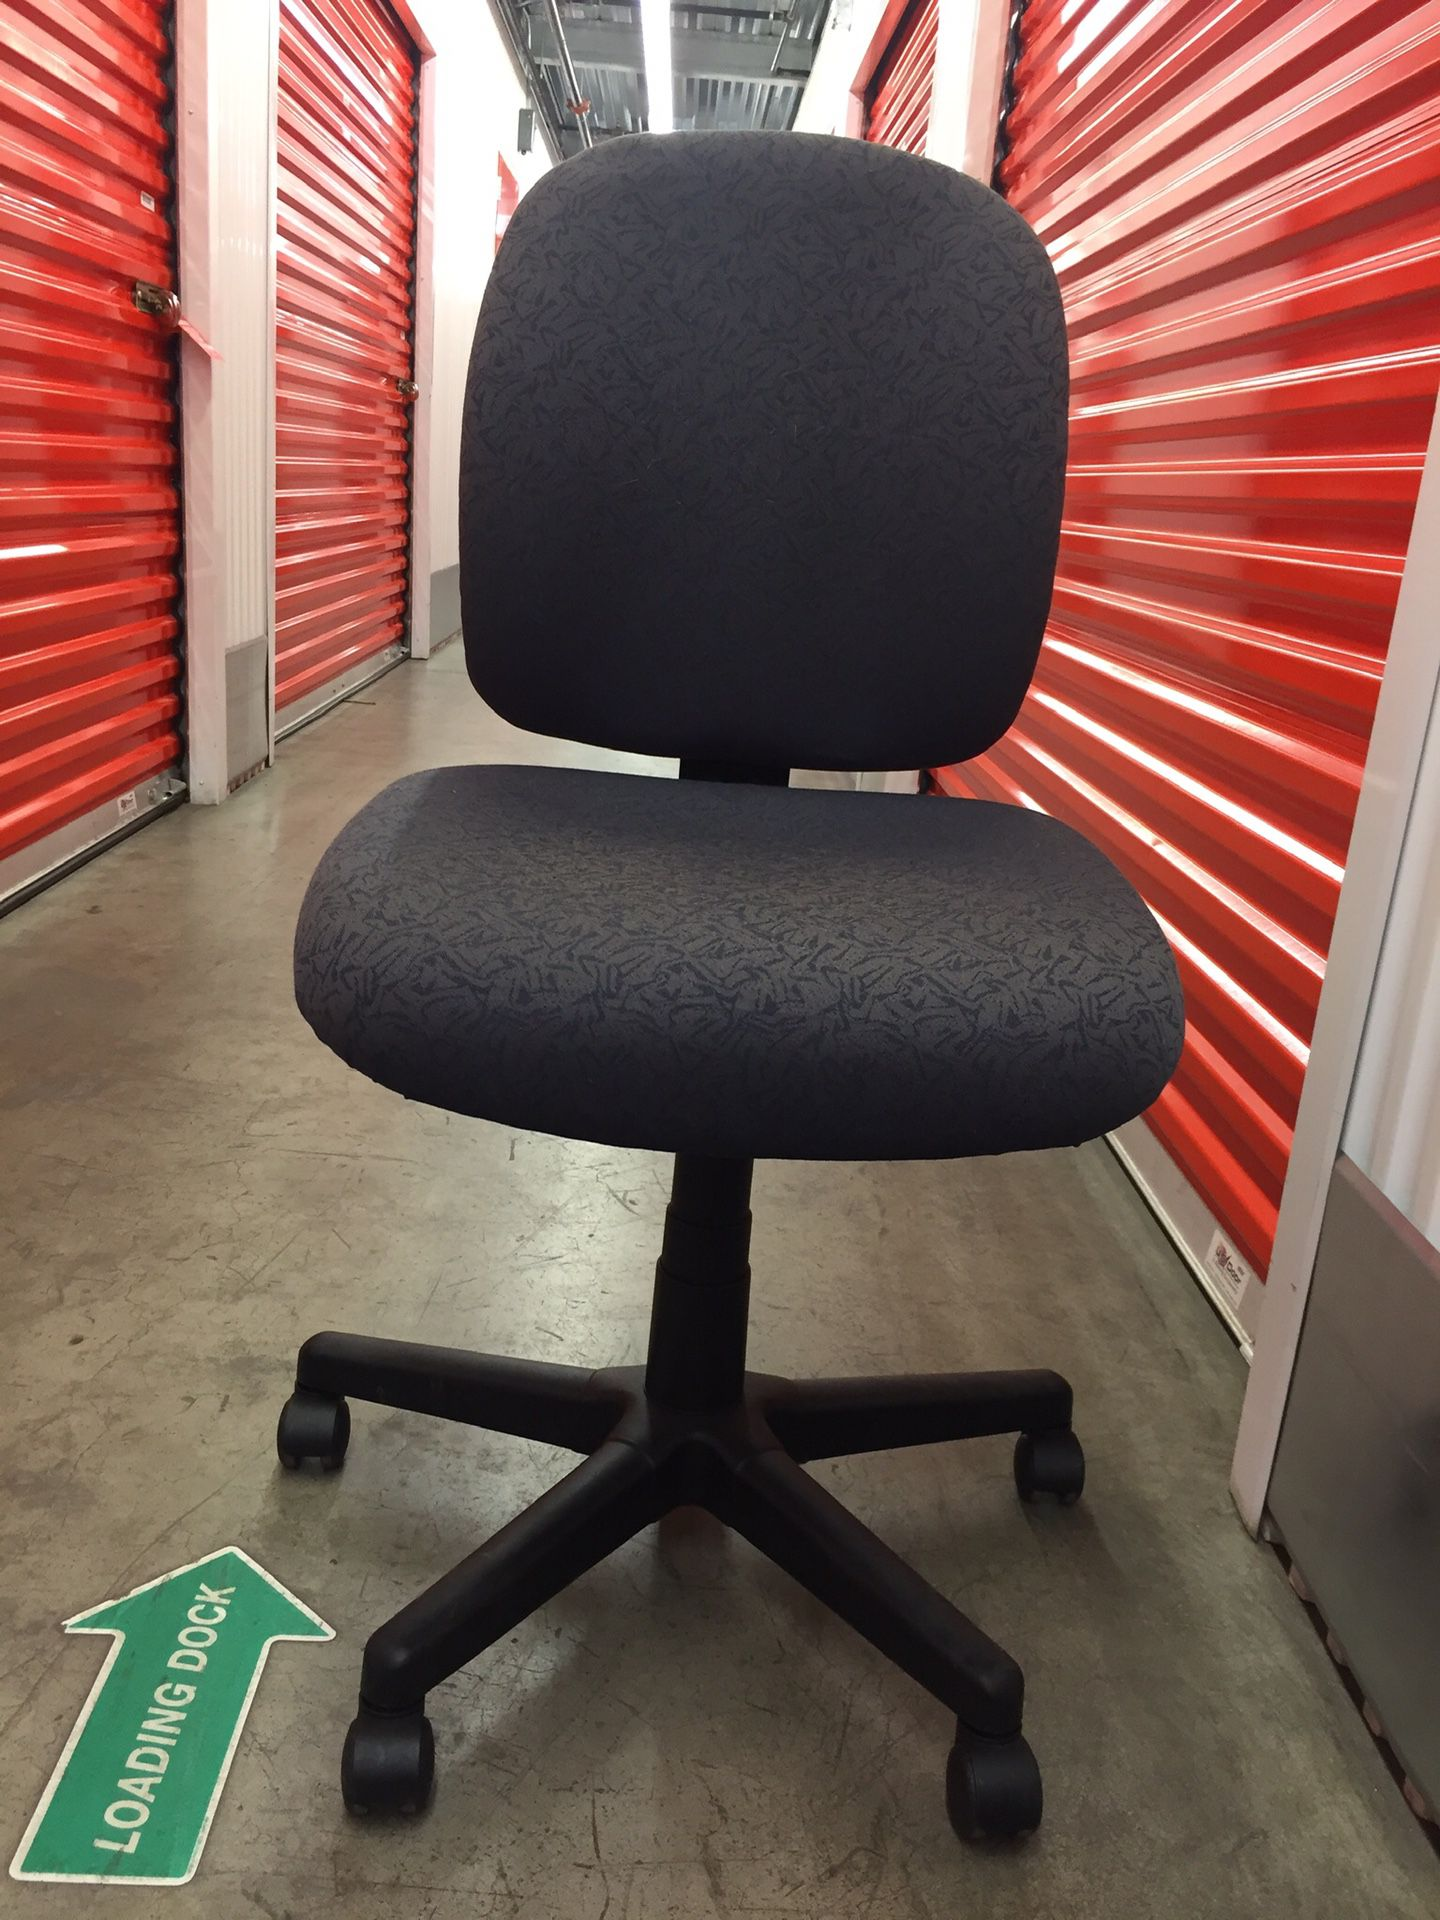 Nice adjustable office chair-comfortable too!!